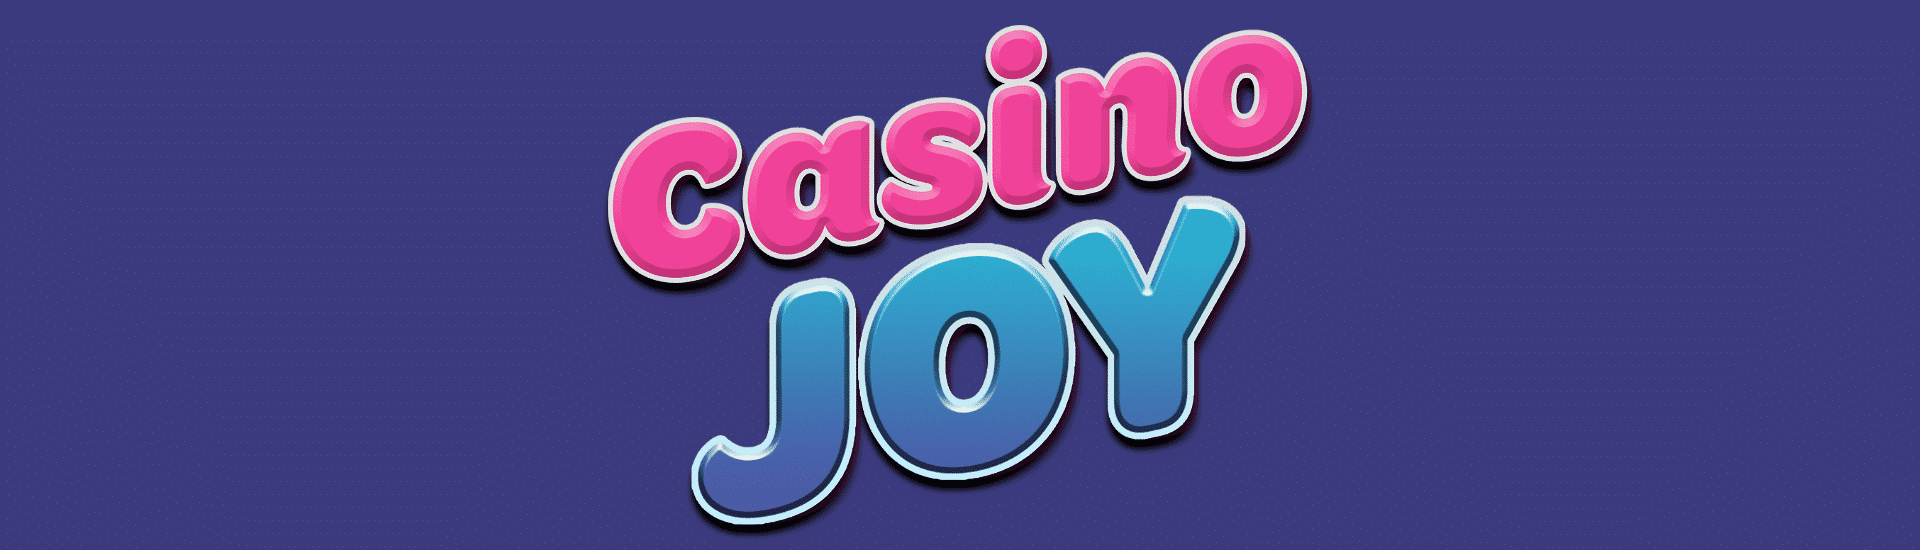 Casino Joy Featured Image